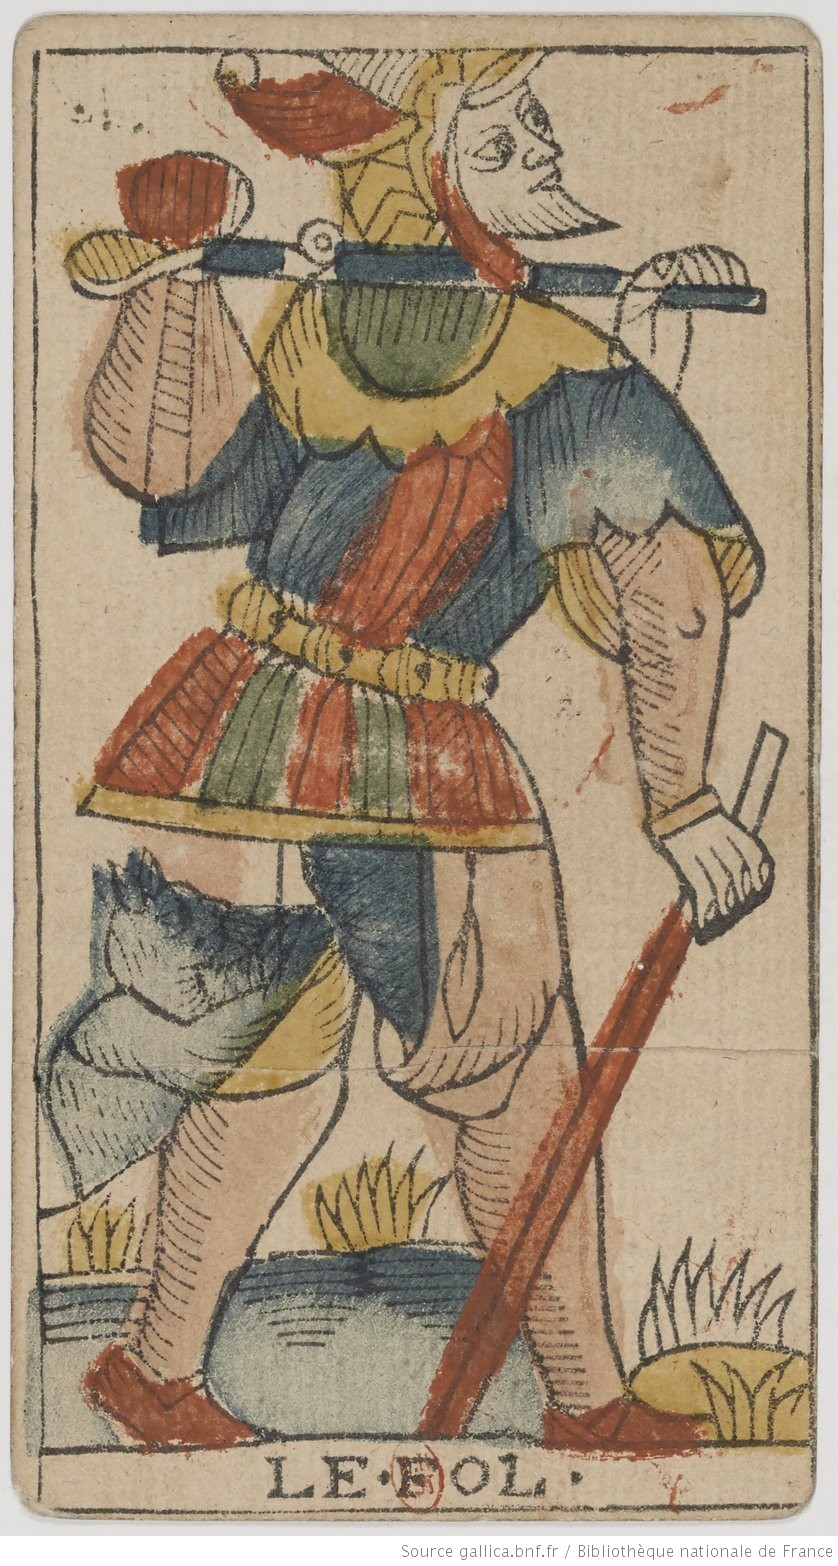 http://gallica.bnf.fr/ark:/12148/btv1b10537343h/f151.highres